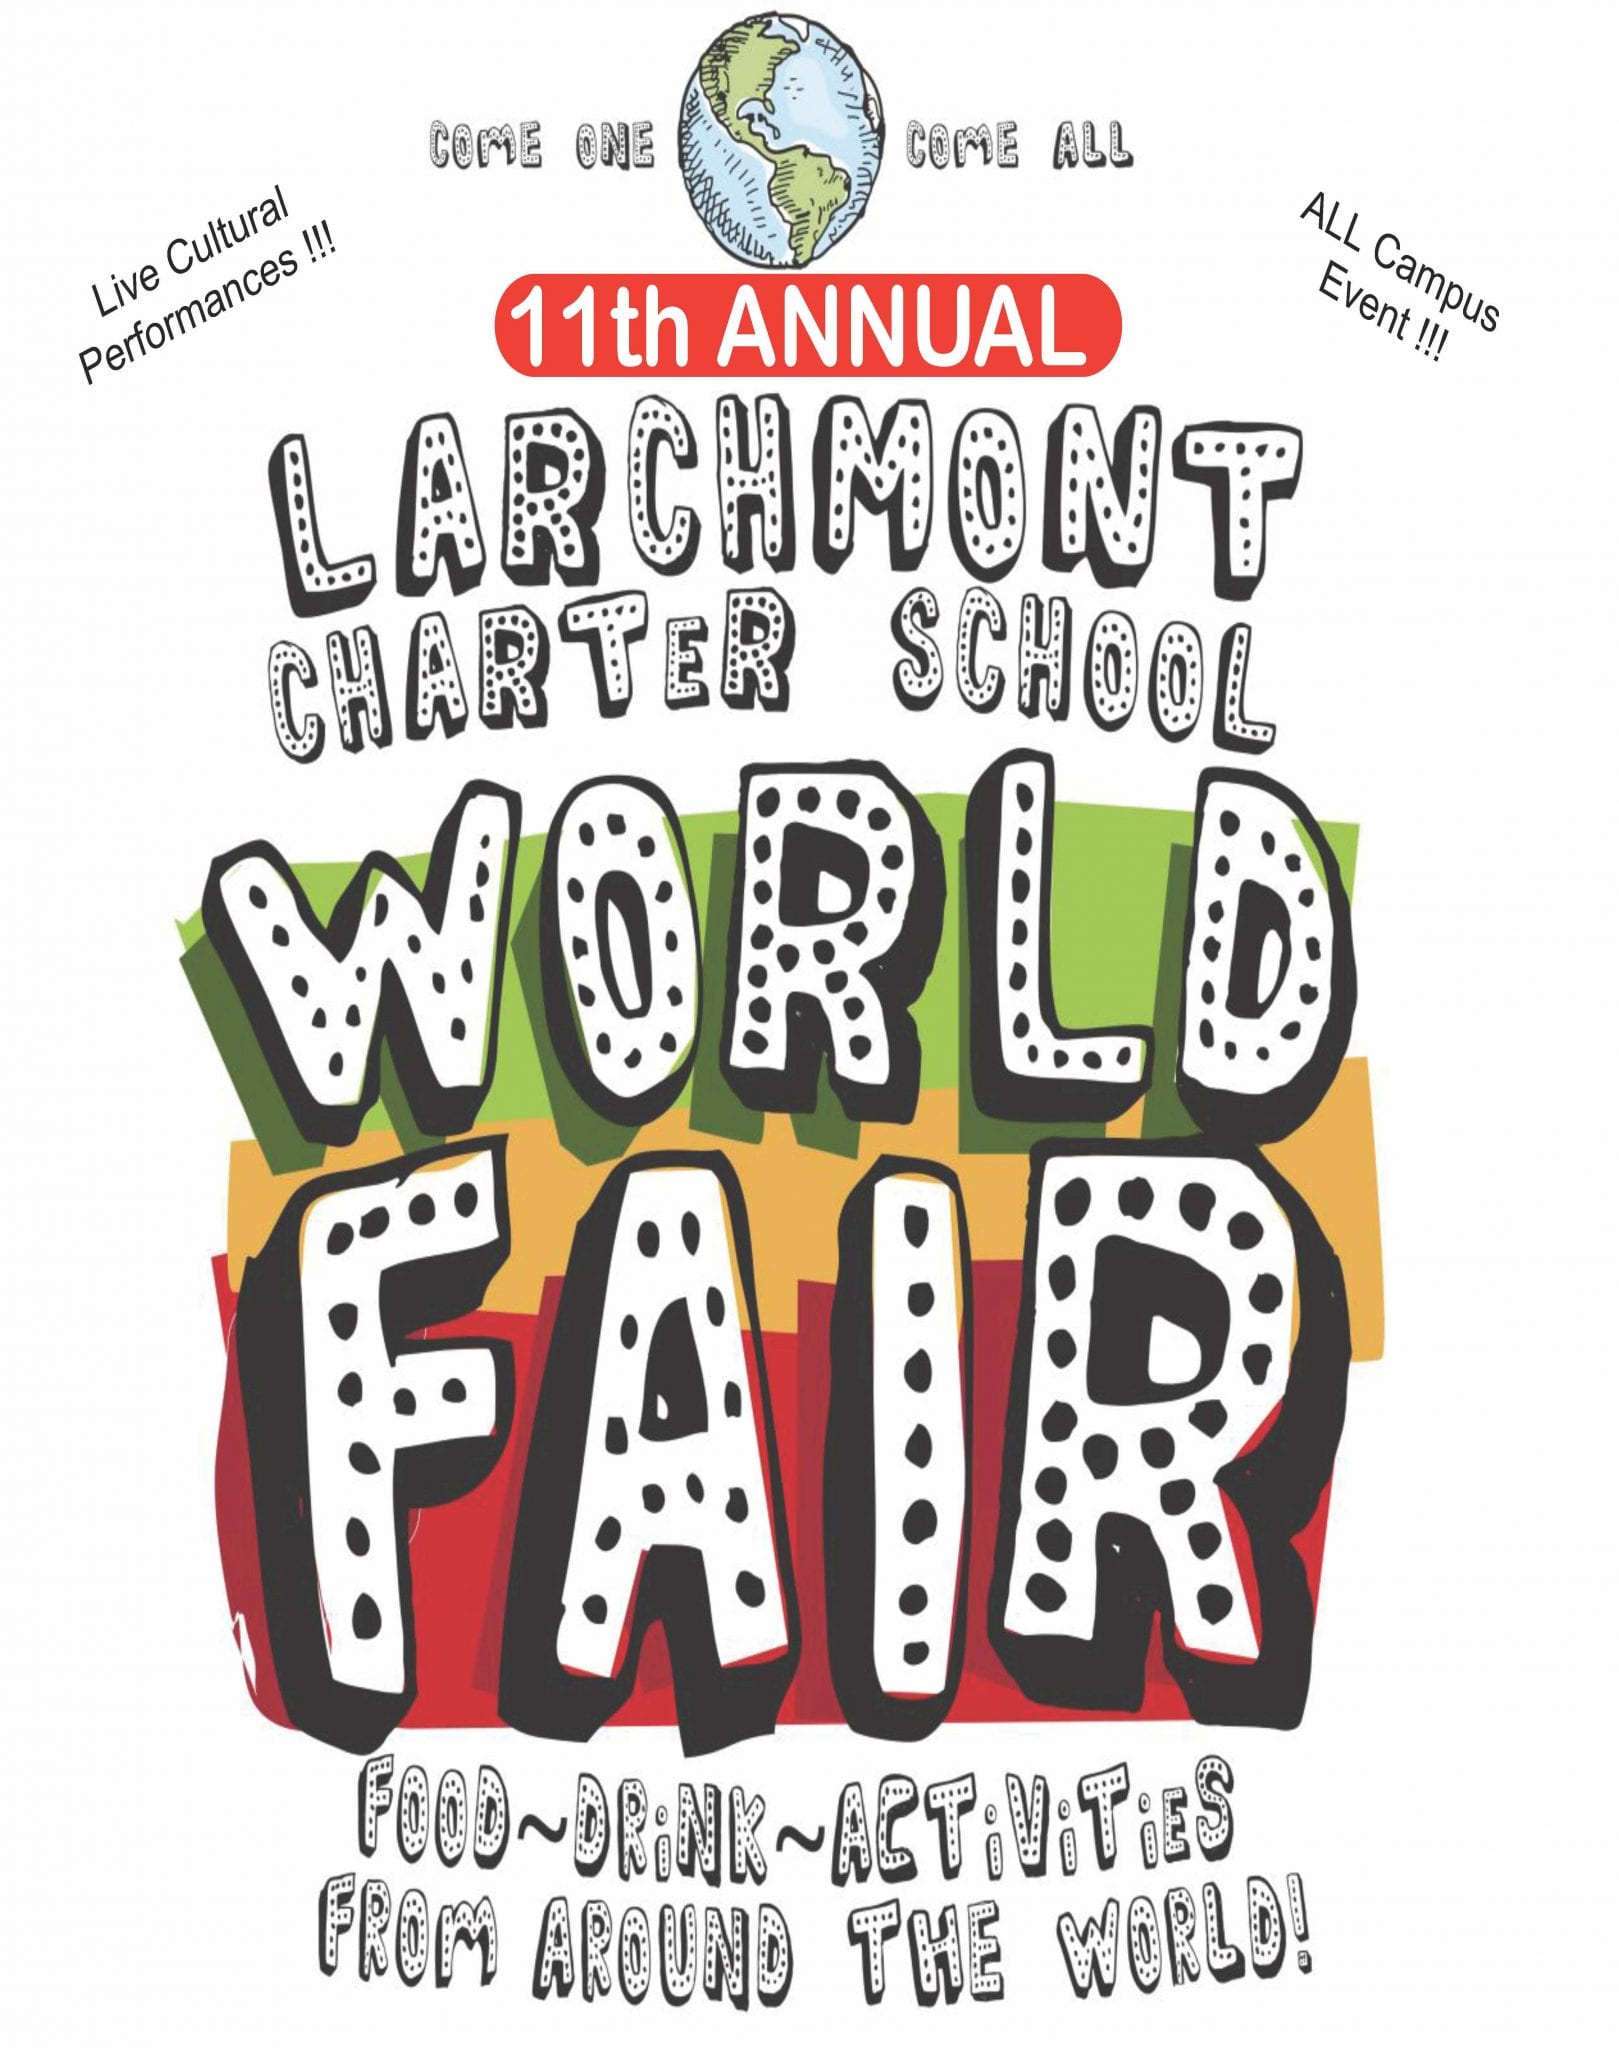 Larchmont Charter School World's Fair